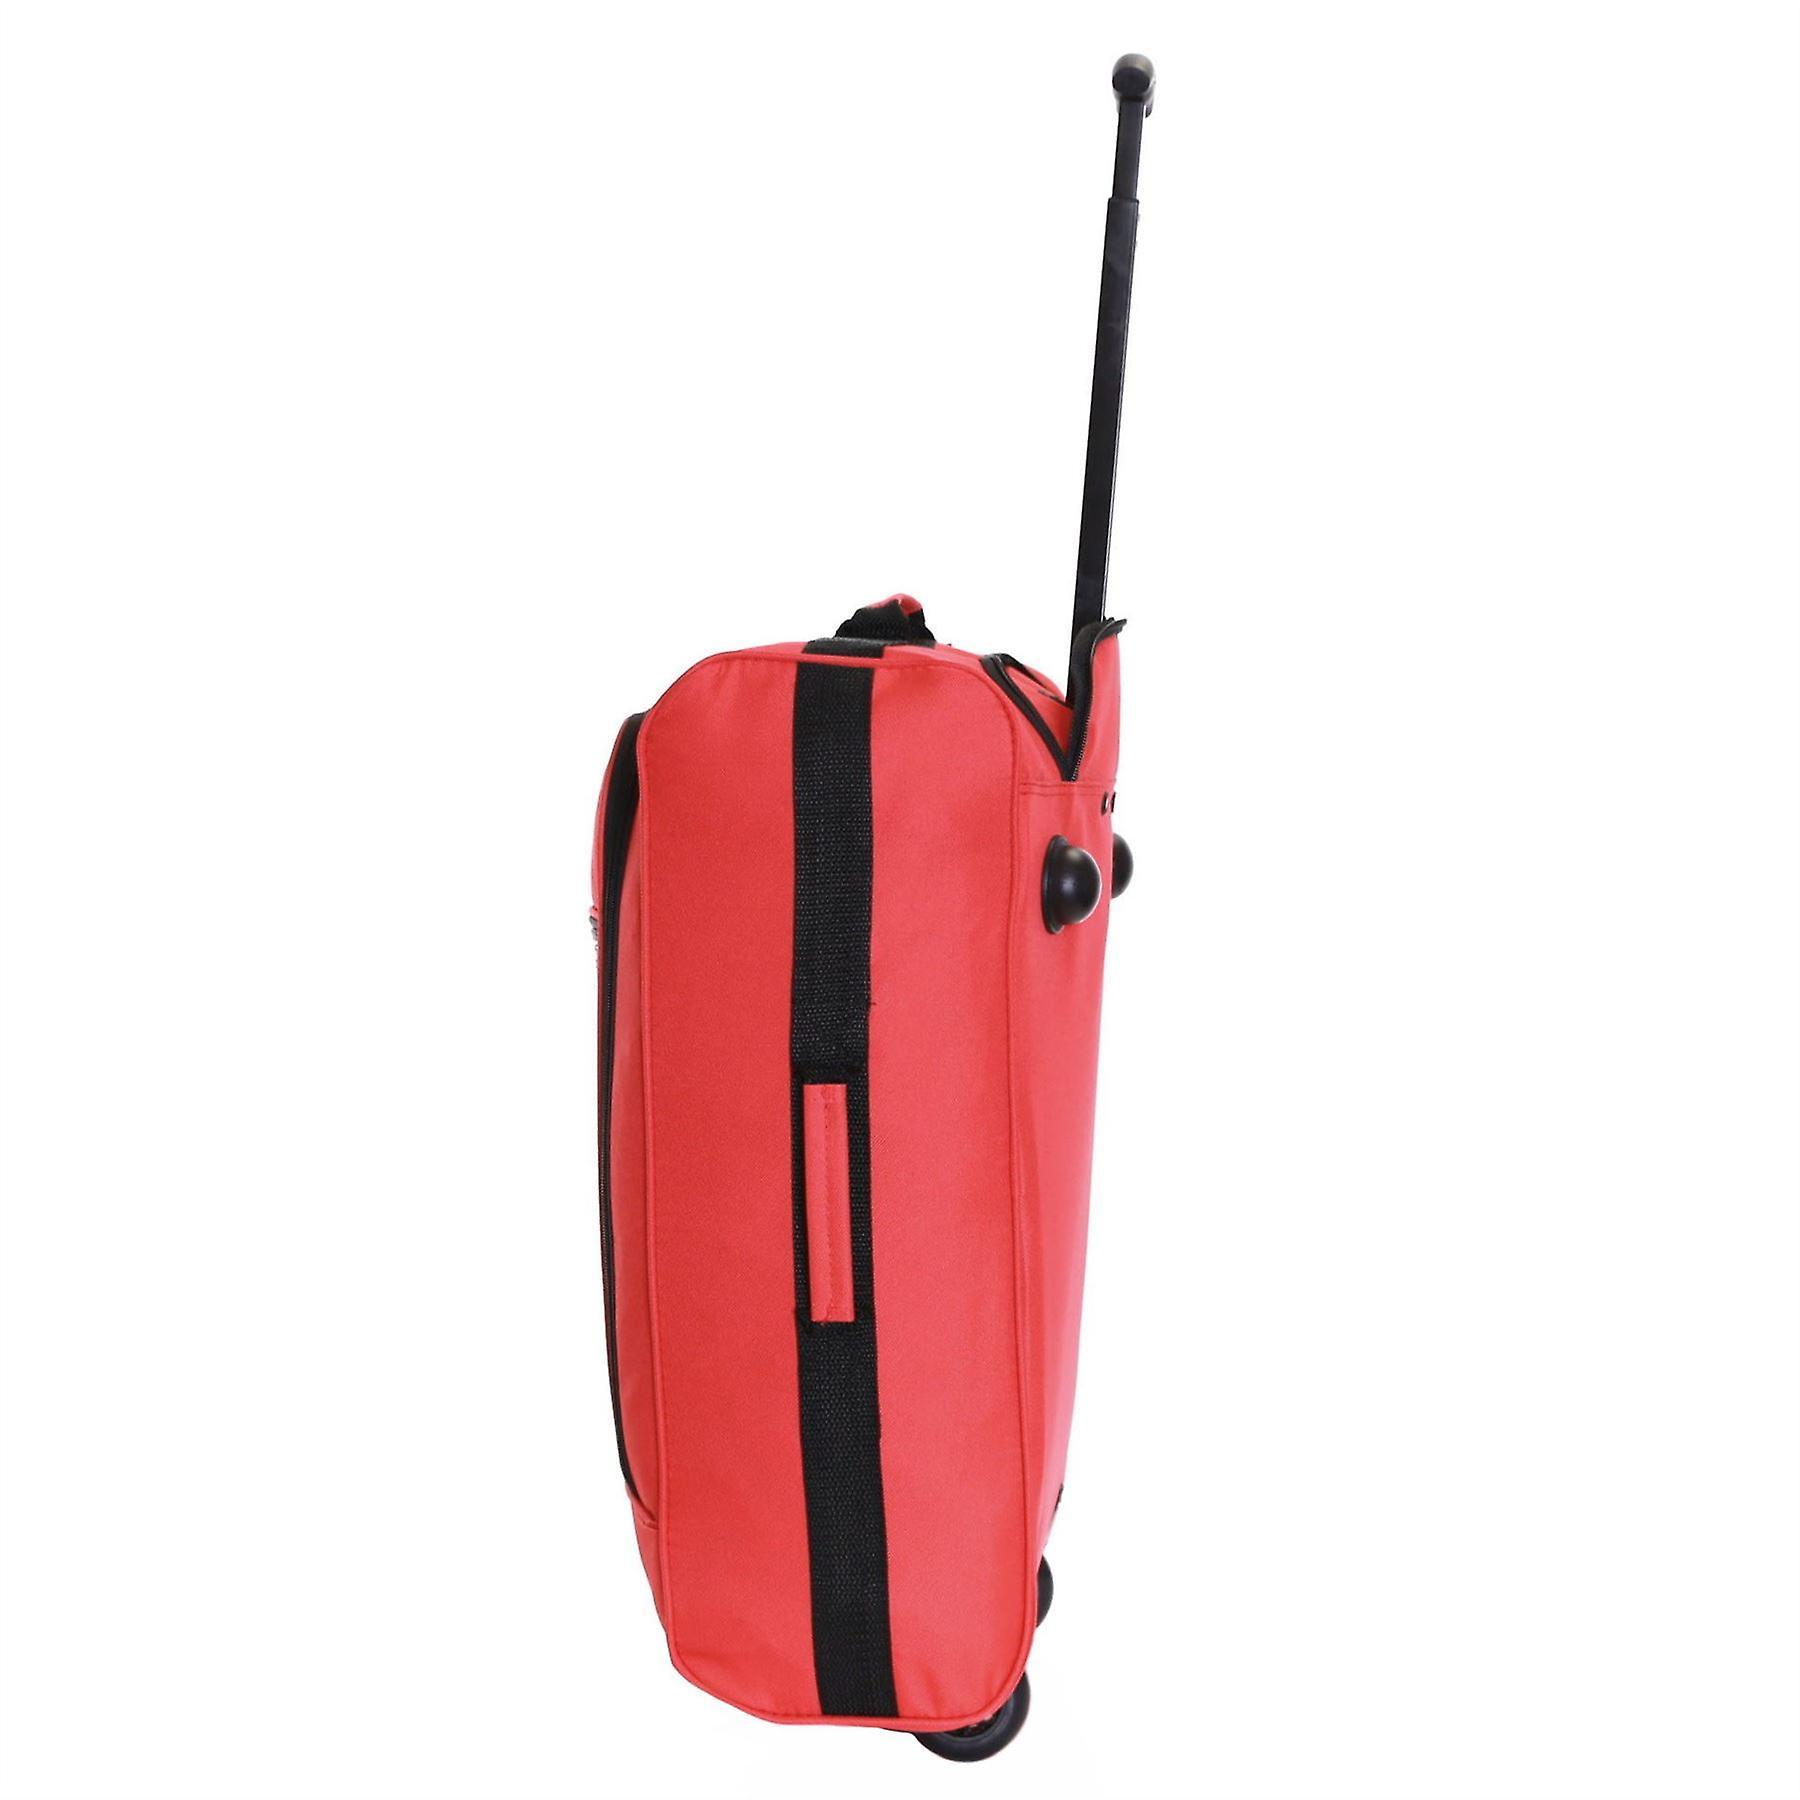 Slimbridge Montecorto Cabin Trolley Bag, Red